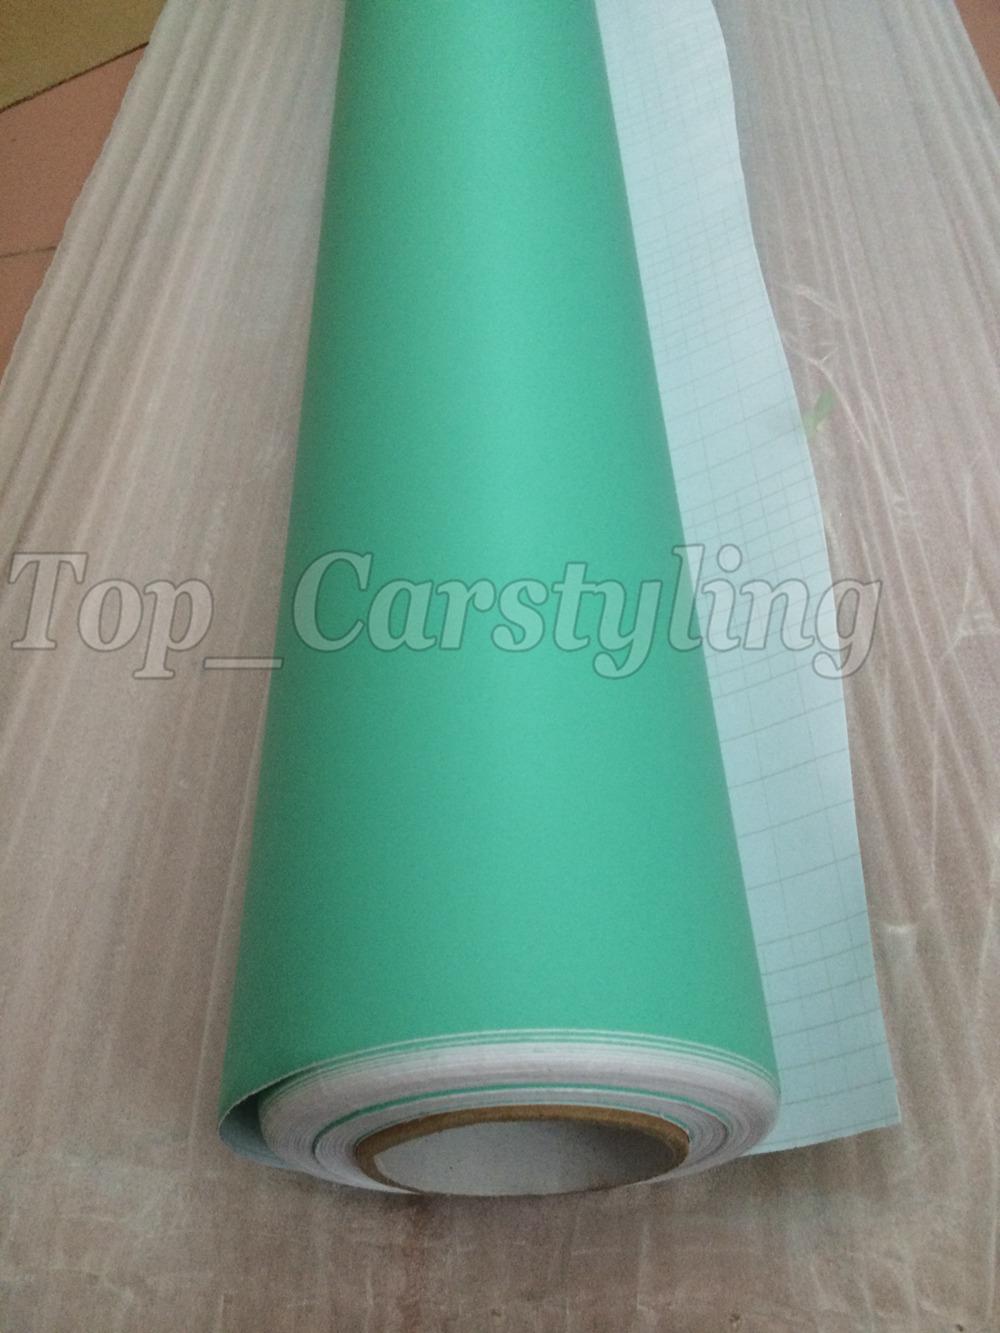 Matte tiffany blue mint green vinyl car wrapping film 3m satin white car wrap Film Foile (5)